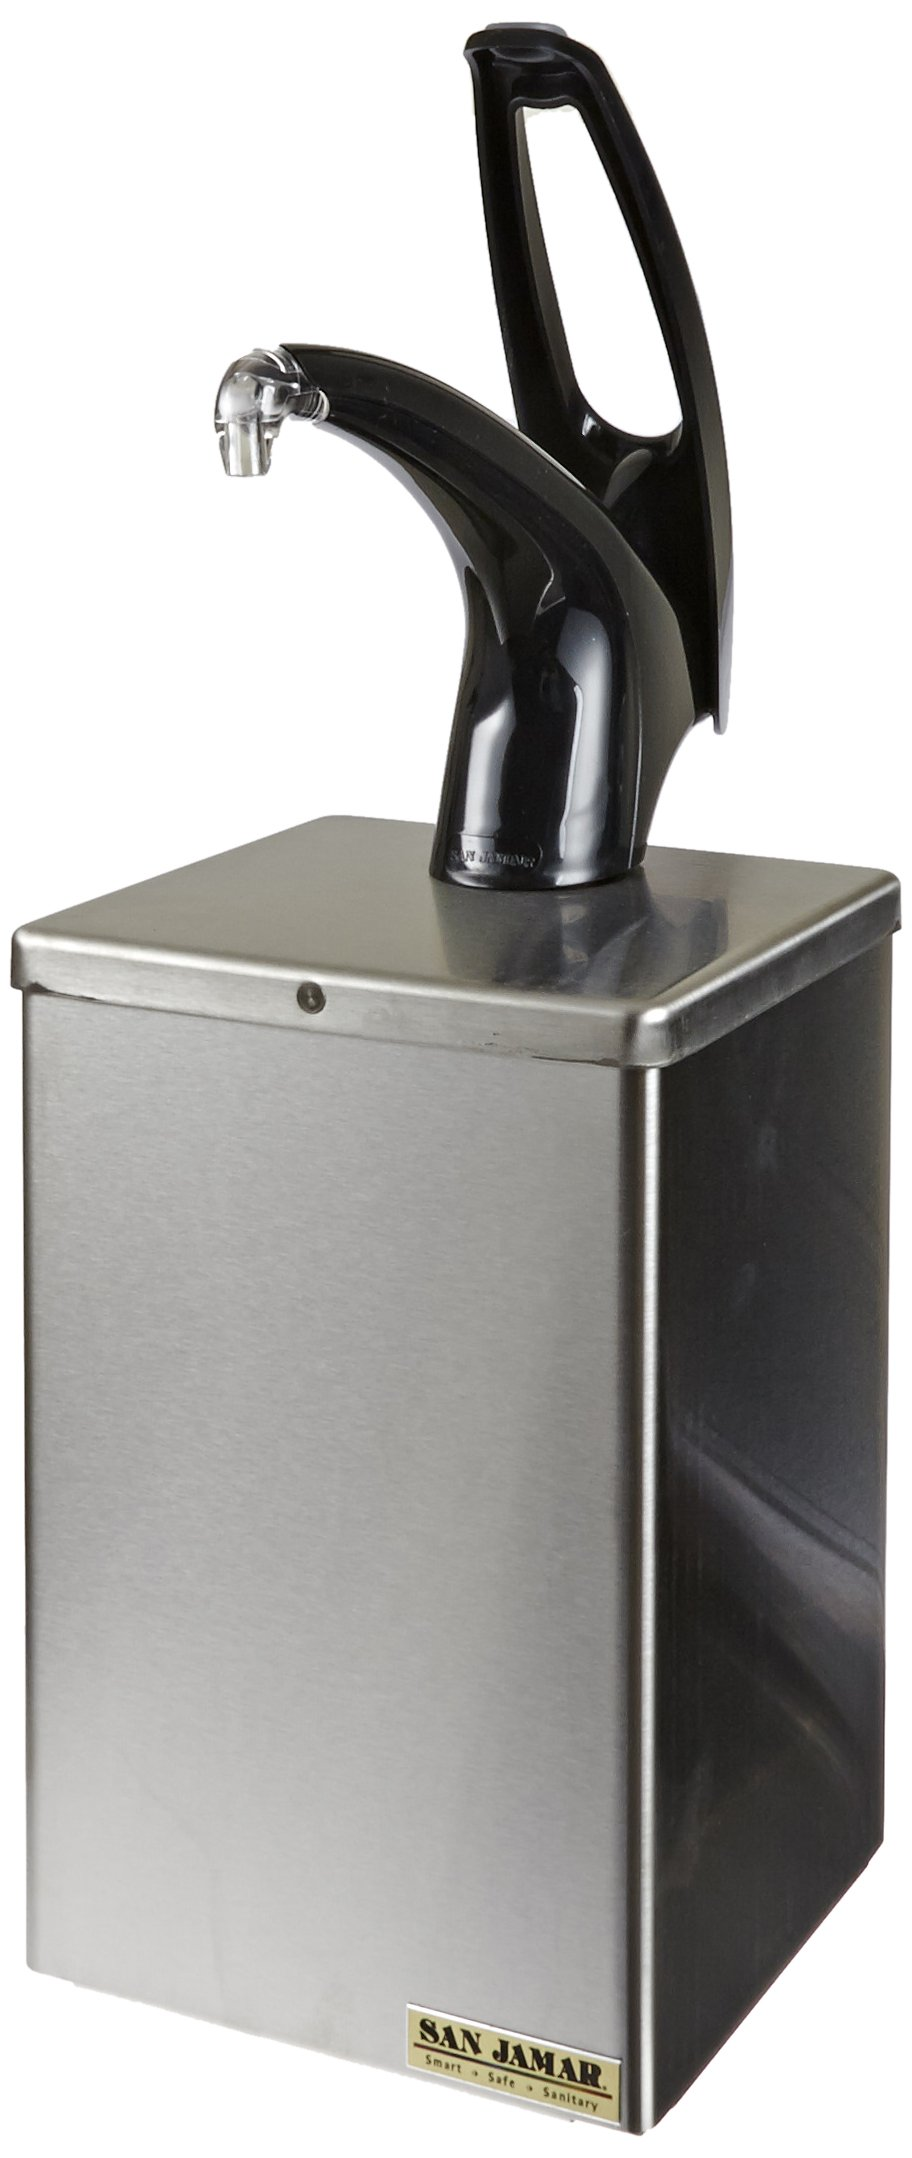 San Jamar P4800 Stainless Steel FrontLine Countertop Box System, 7'' Width x 20-1/4'' Height x 7'' Depth, Black